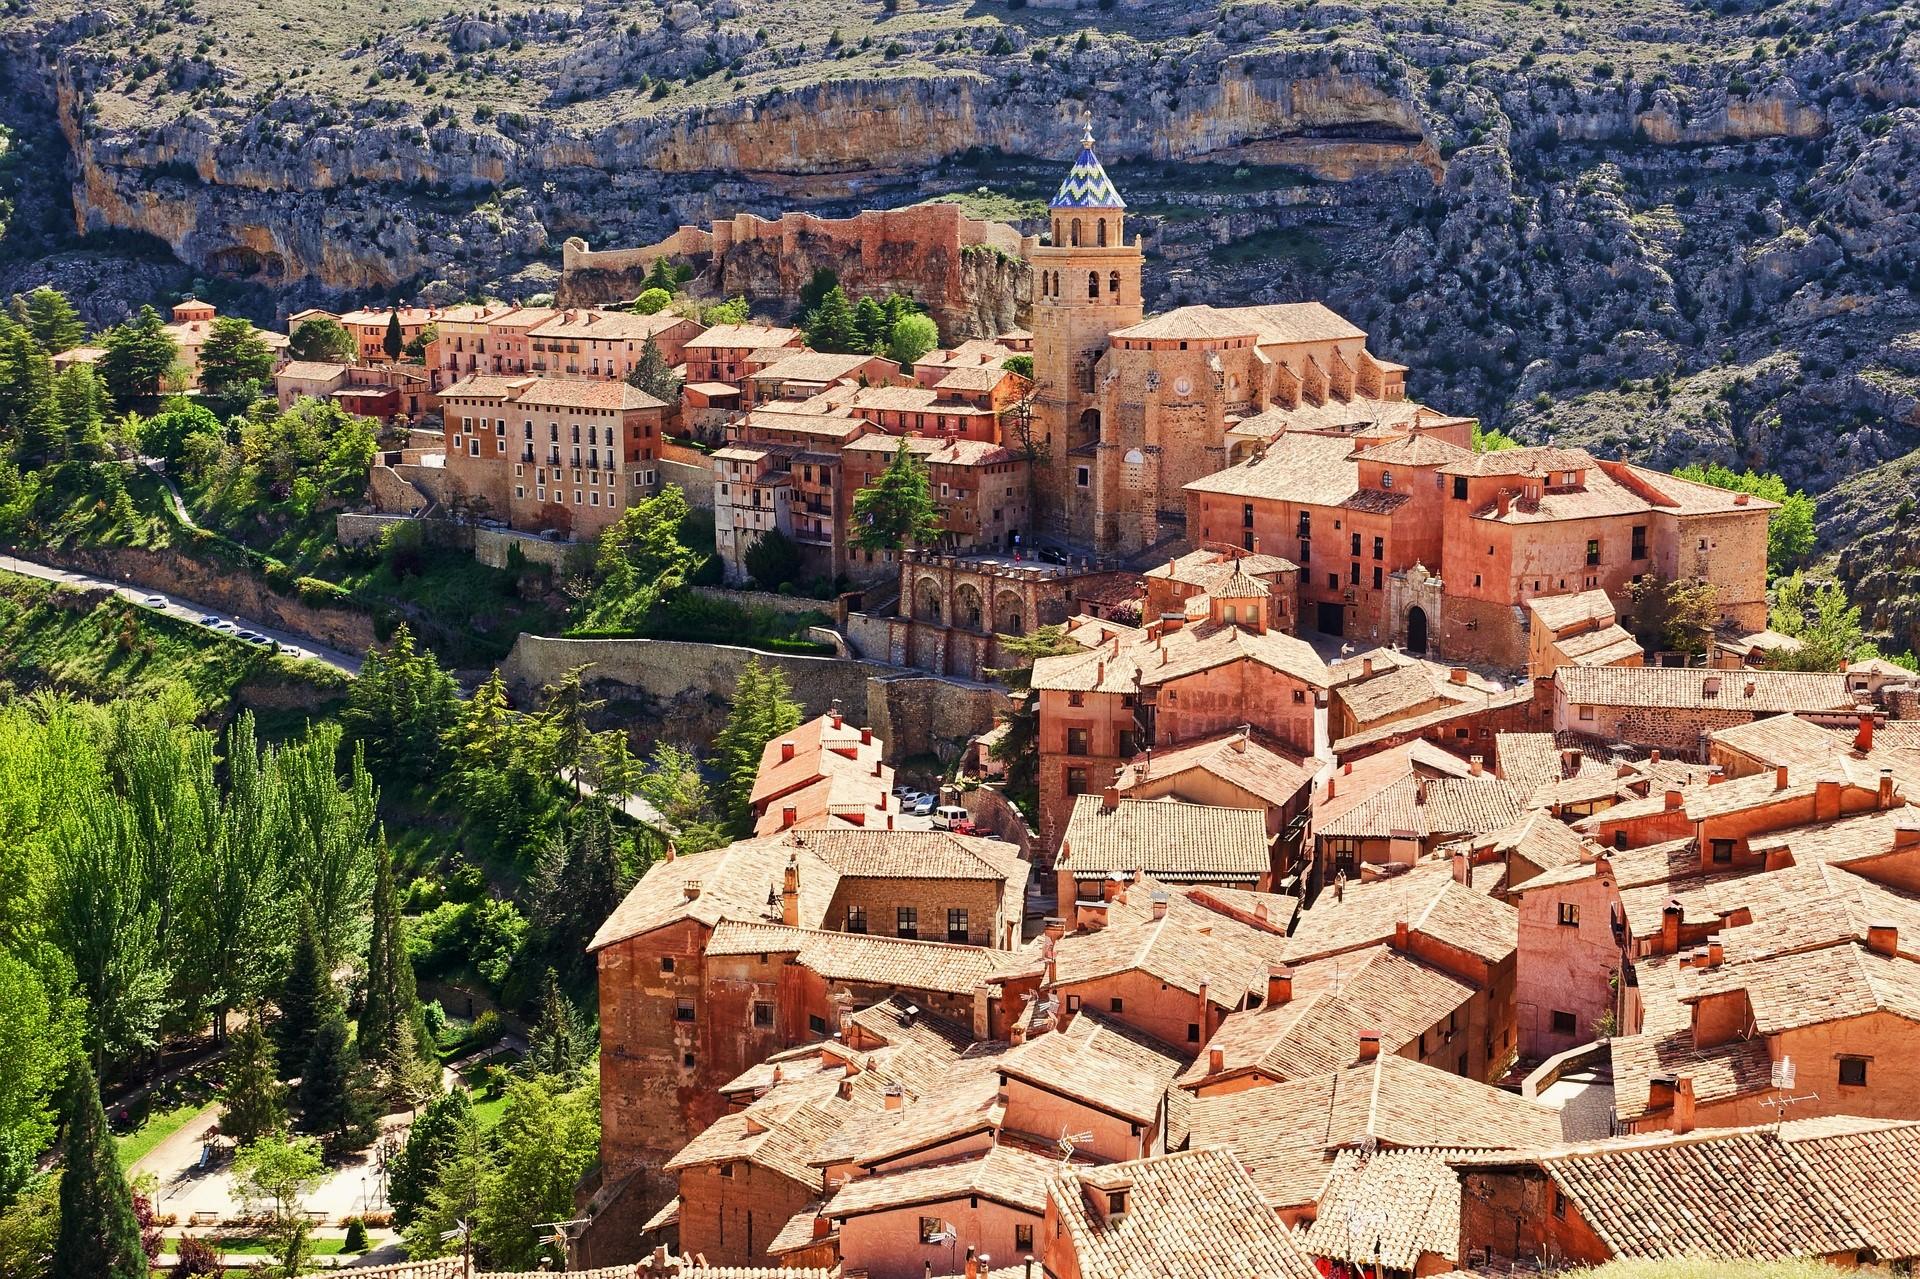 Albarracín (Teruel province)